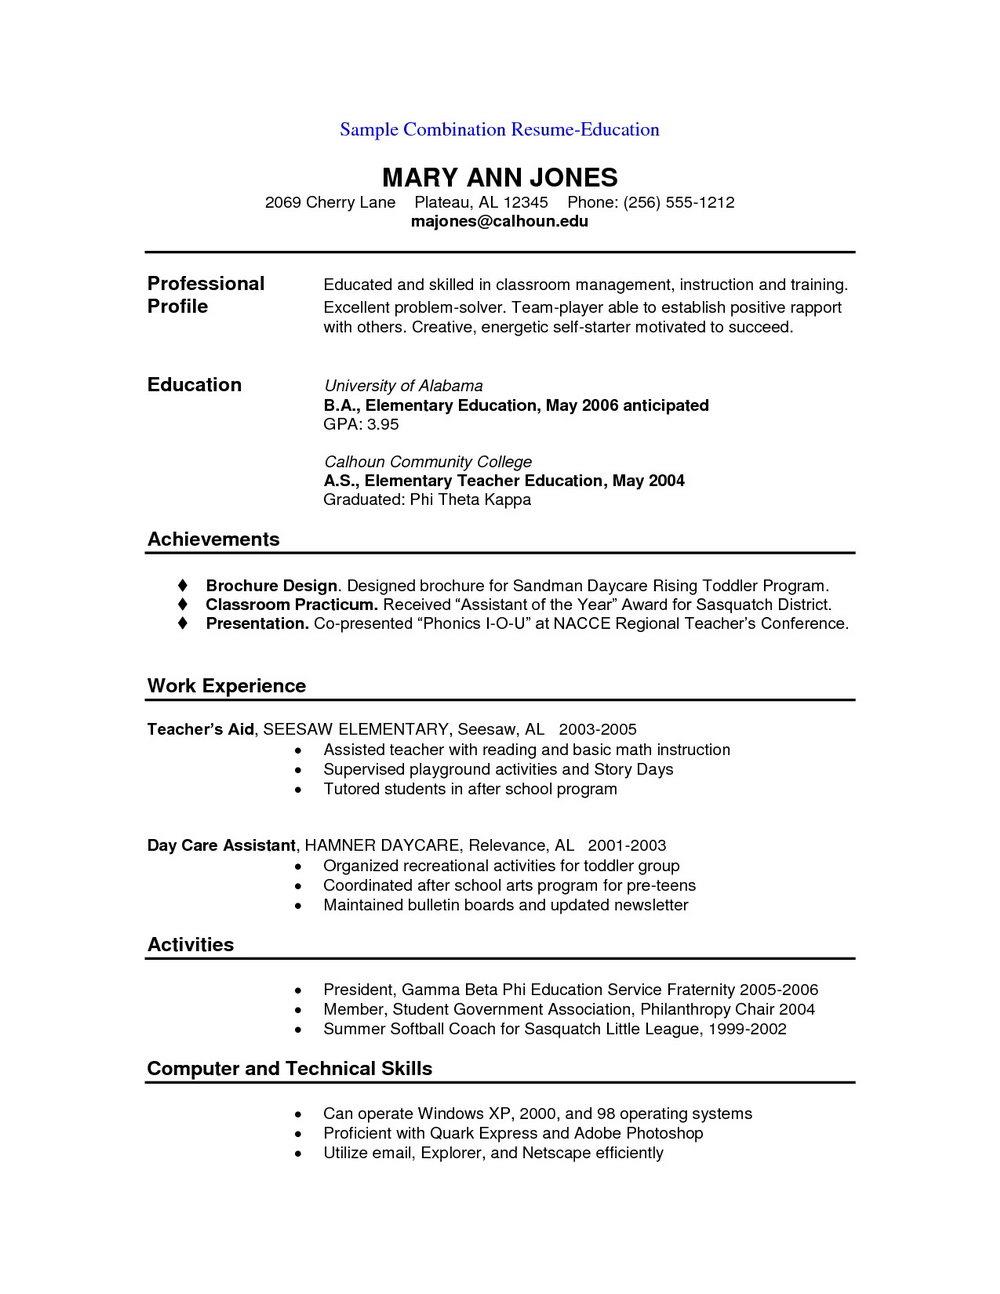 Free Resume Template Downloads Australia